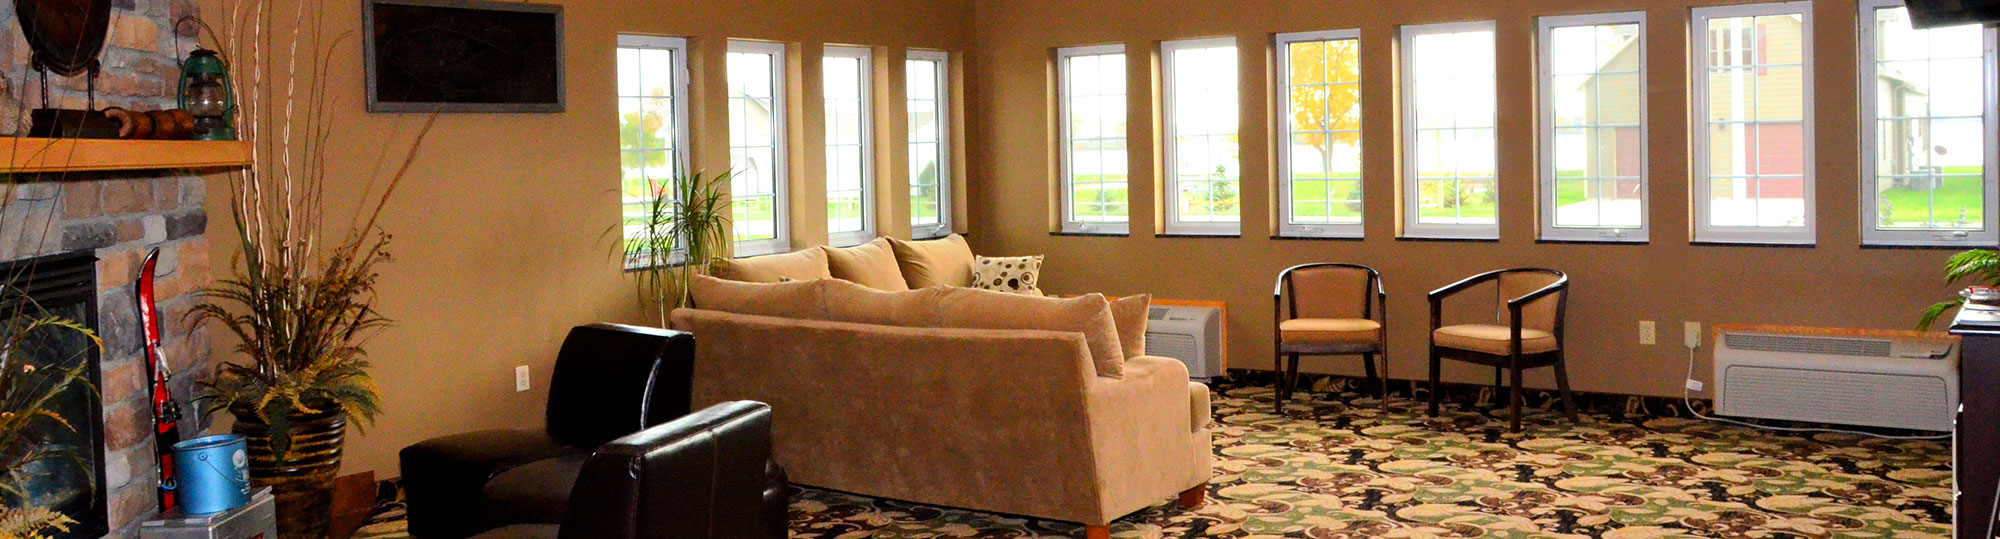 Cobblestone Inn & Suites Lake View